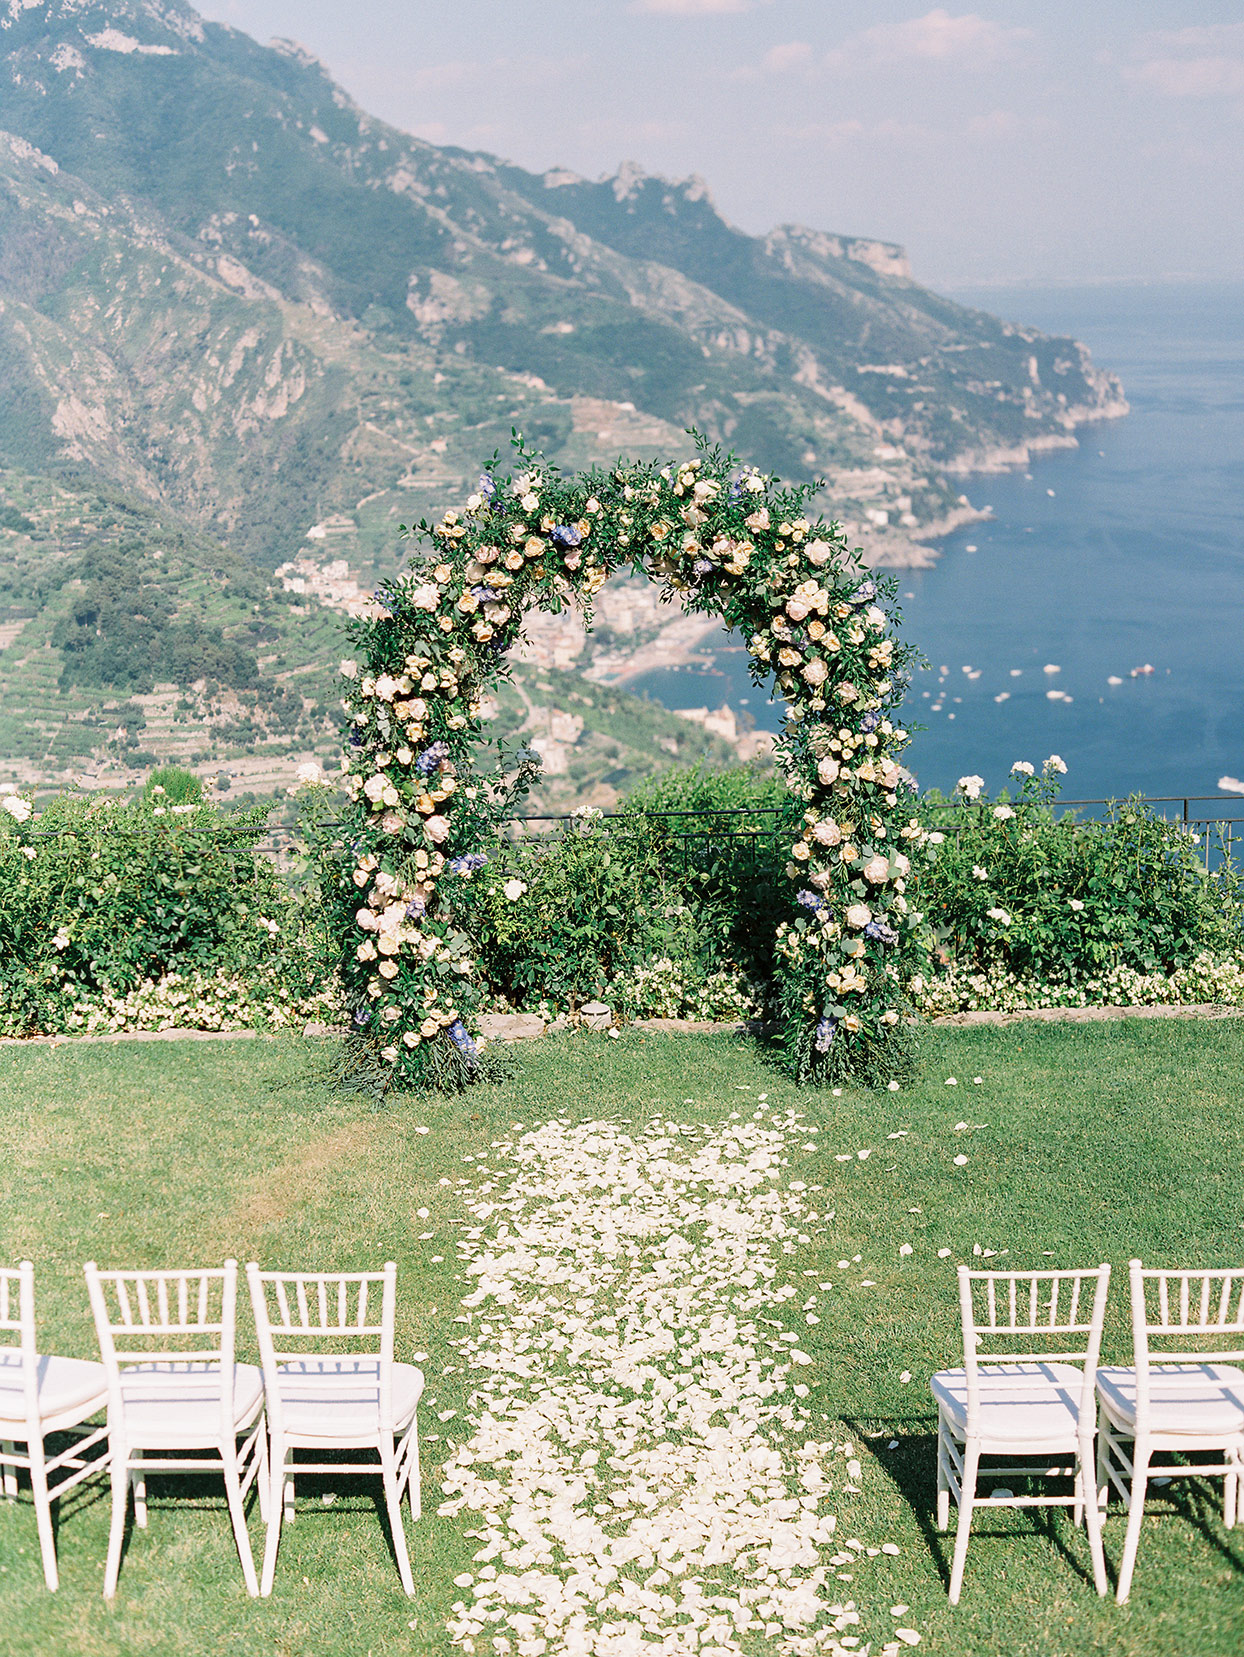 jacqueline david wedding ceremony space overlooking mountains